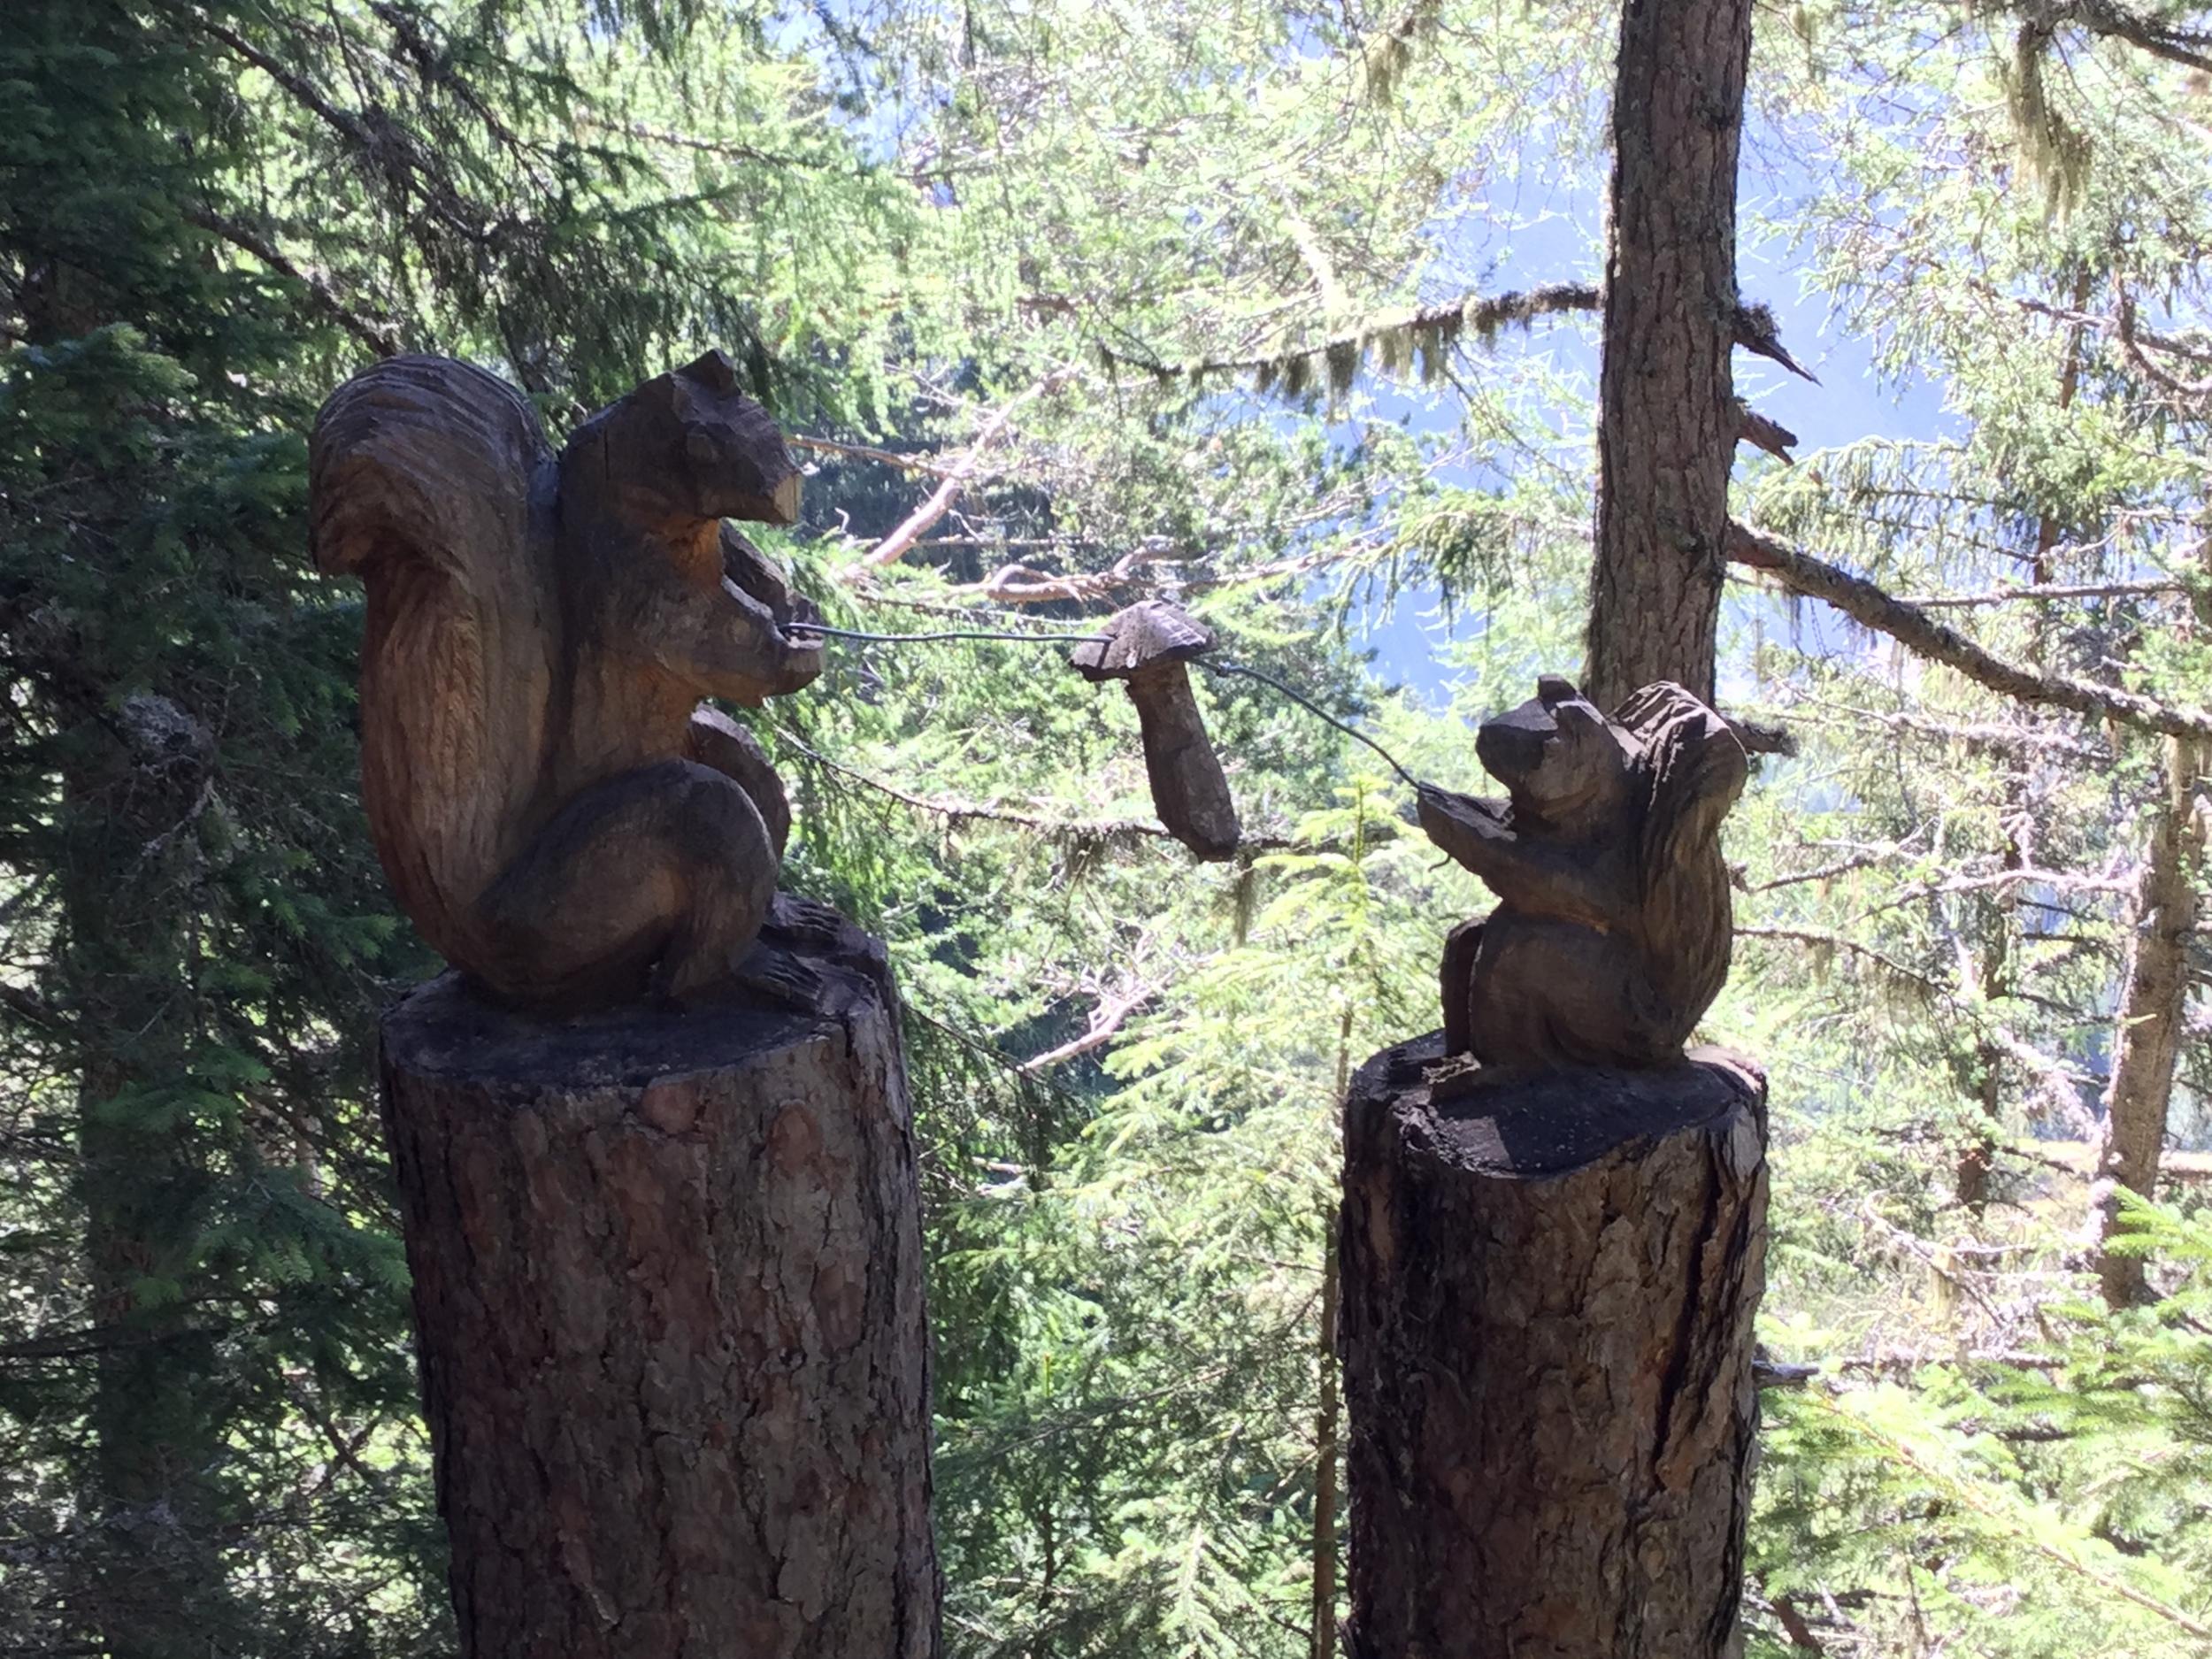 Two squirrels along the Sentier des Champignons.